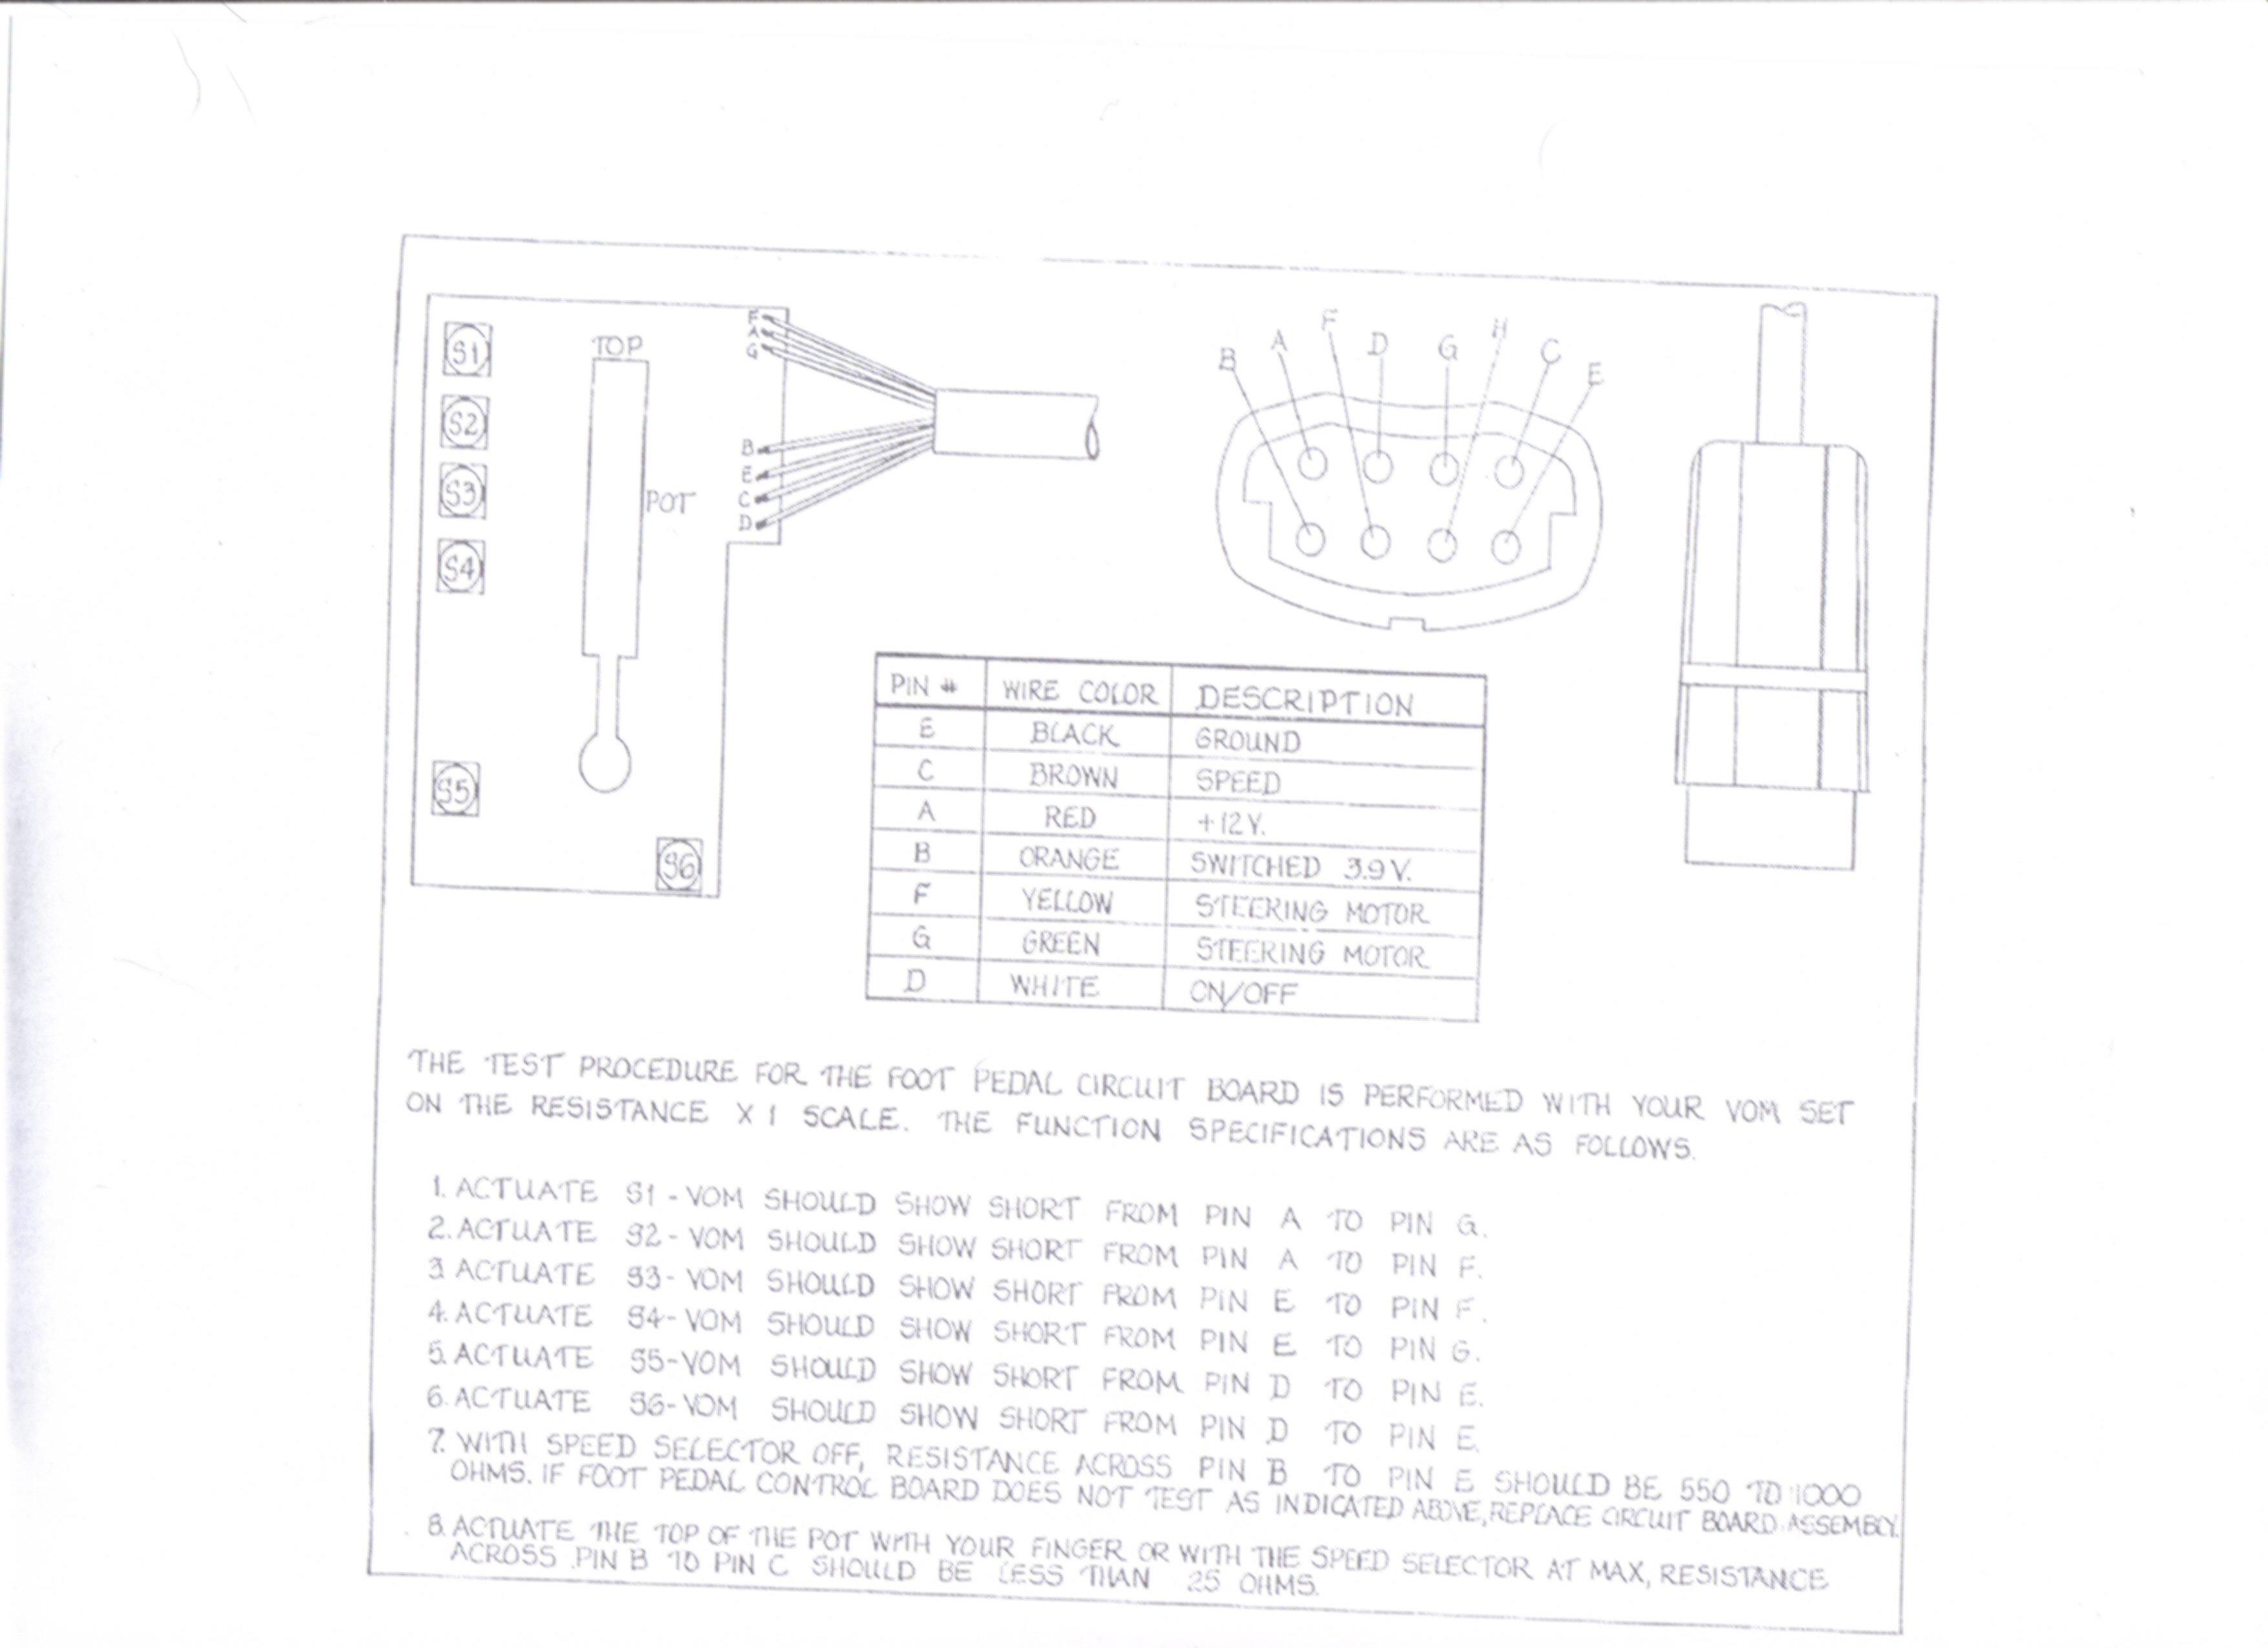 Minn Kota Foot Pedal Wiring Diagram 12 Volt Magnificent 12v Schematic Images Electrical 2550